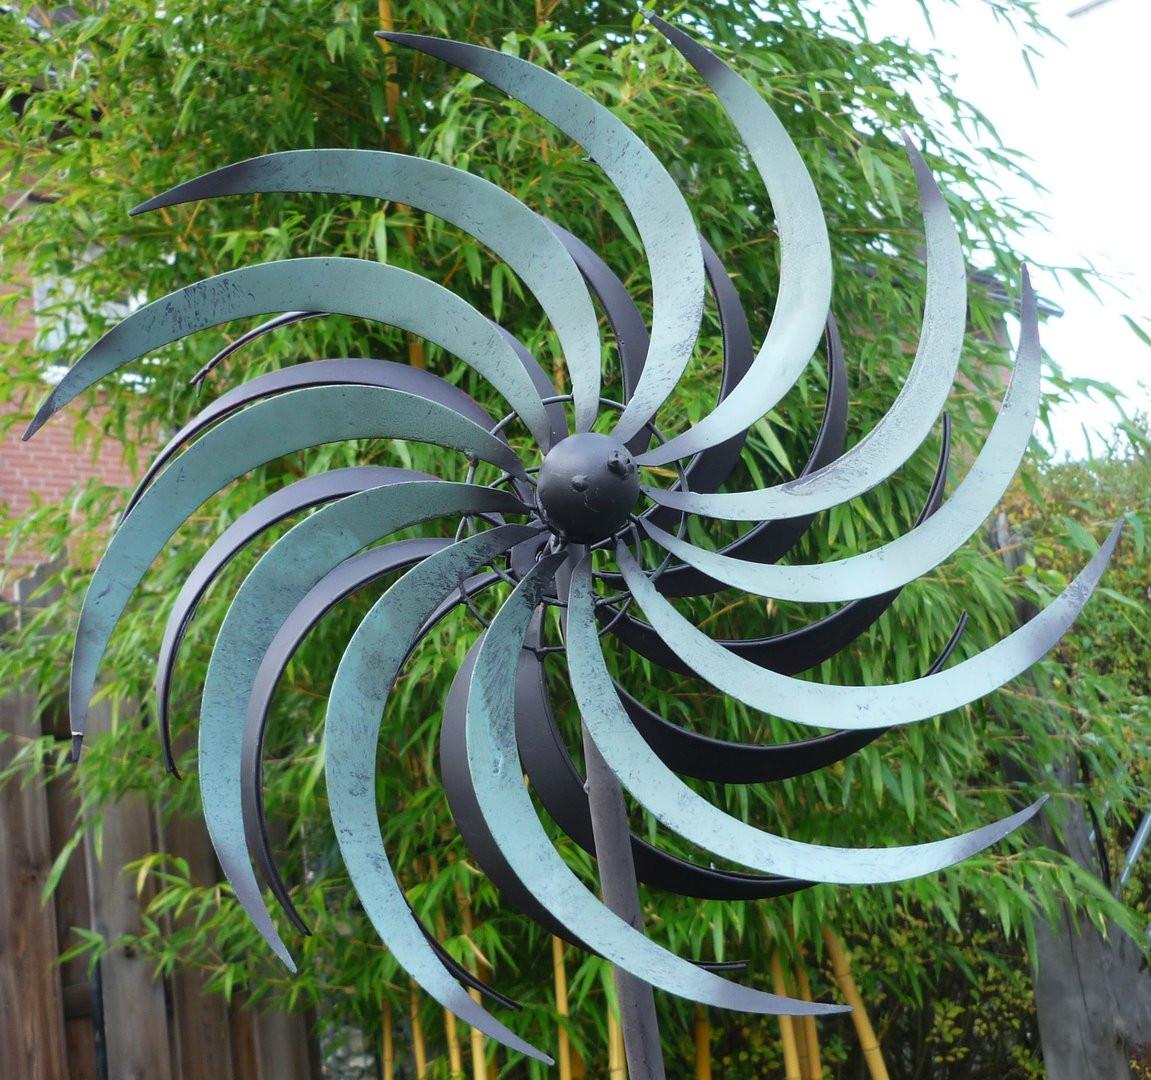 Windrad Garten  Windspiel Windrad Garten Figur Metall Wind Rad Sonne